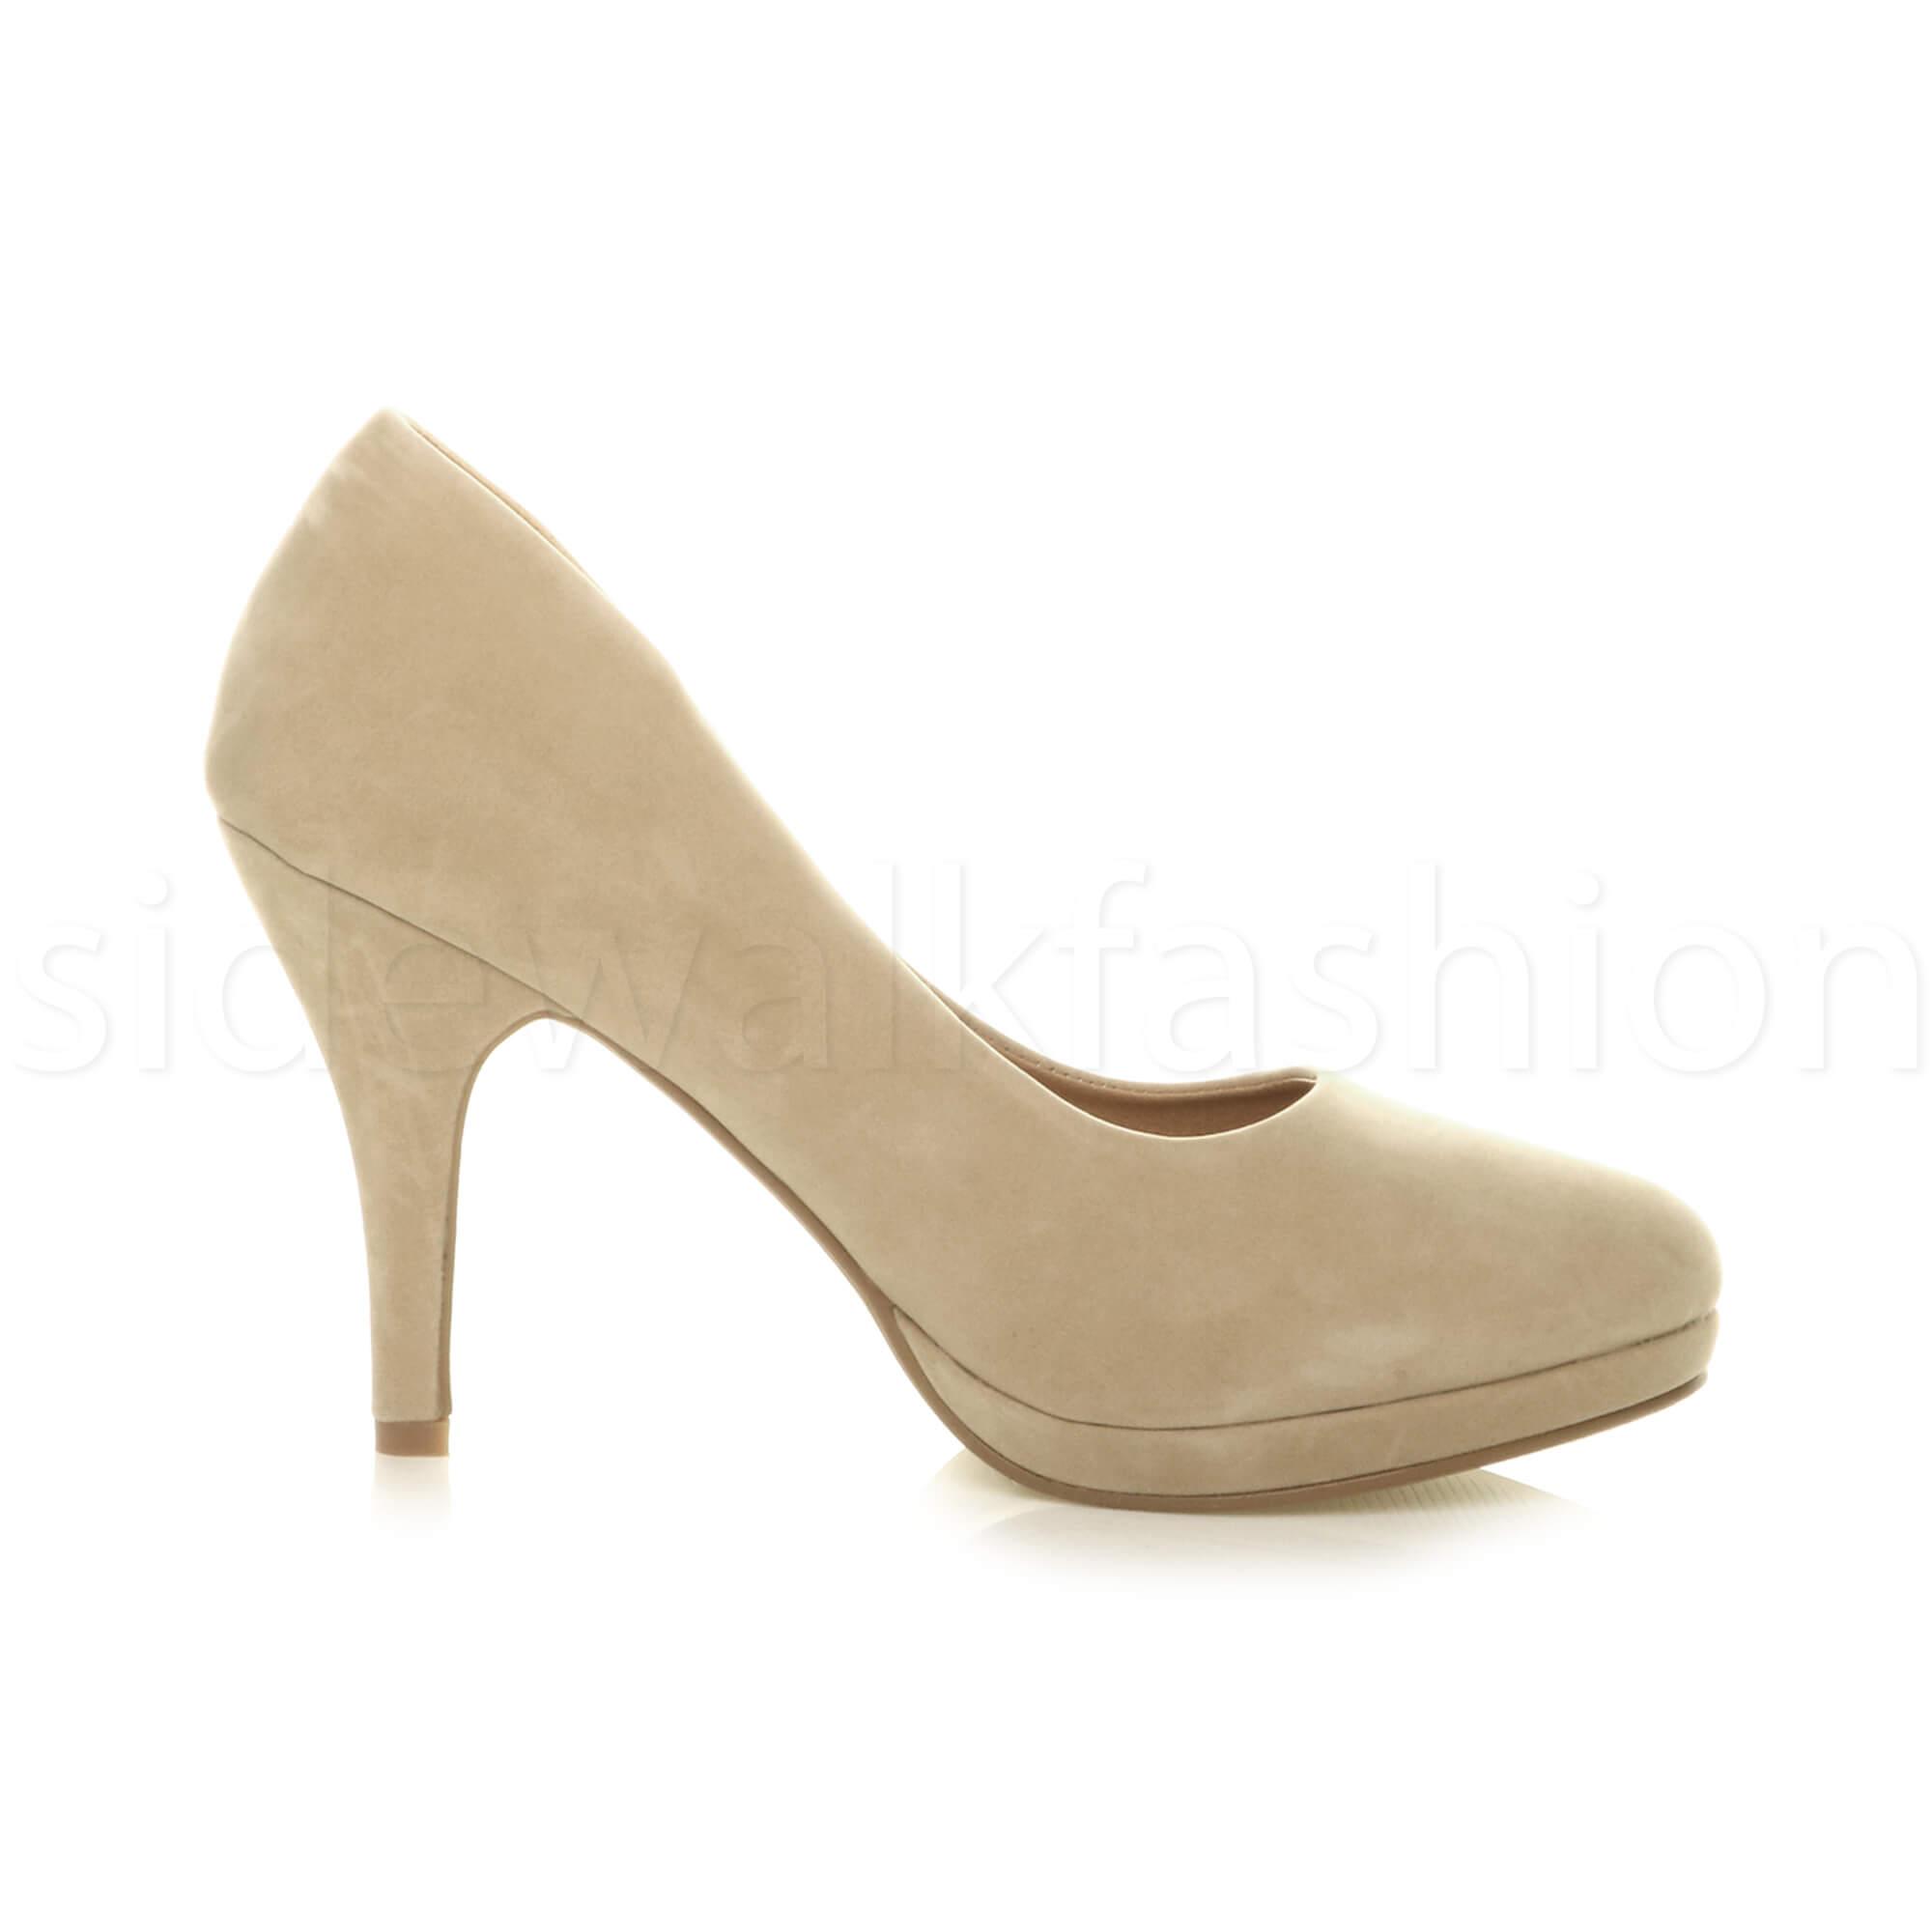 Womens-ladies-high-mid-heel-platform-wedding-evening-bridesmaid-court-shoes-size thumbnail 130